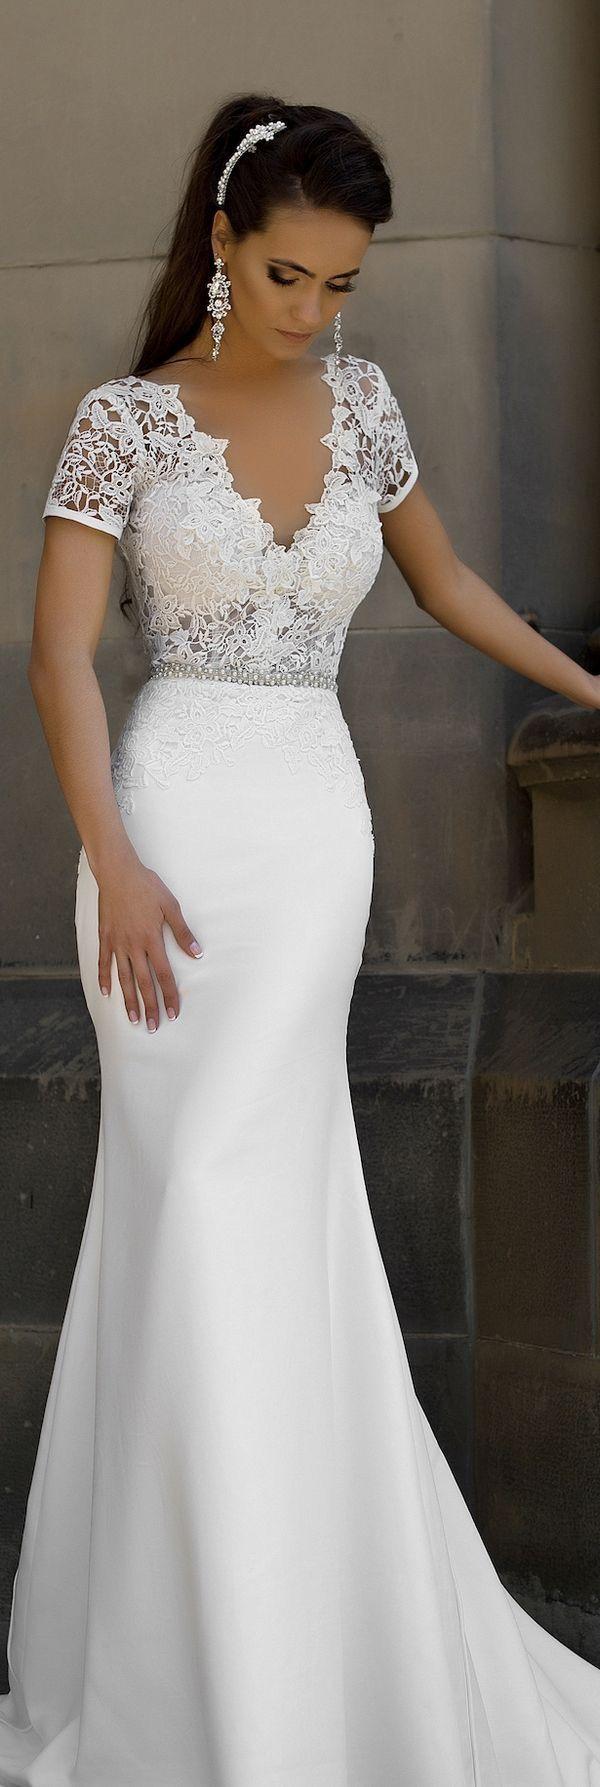 best Šaty svatební i images on pinterest bridal gowns